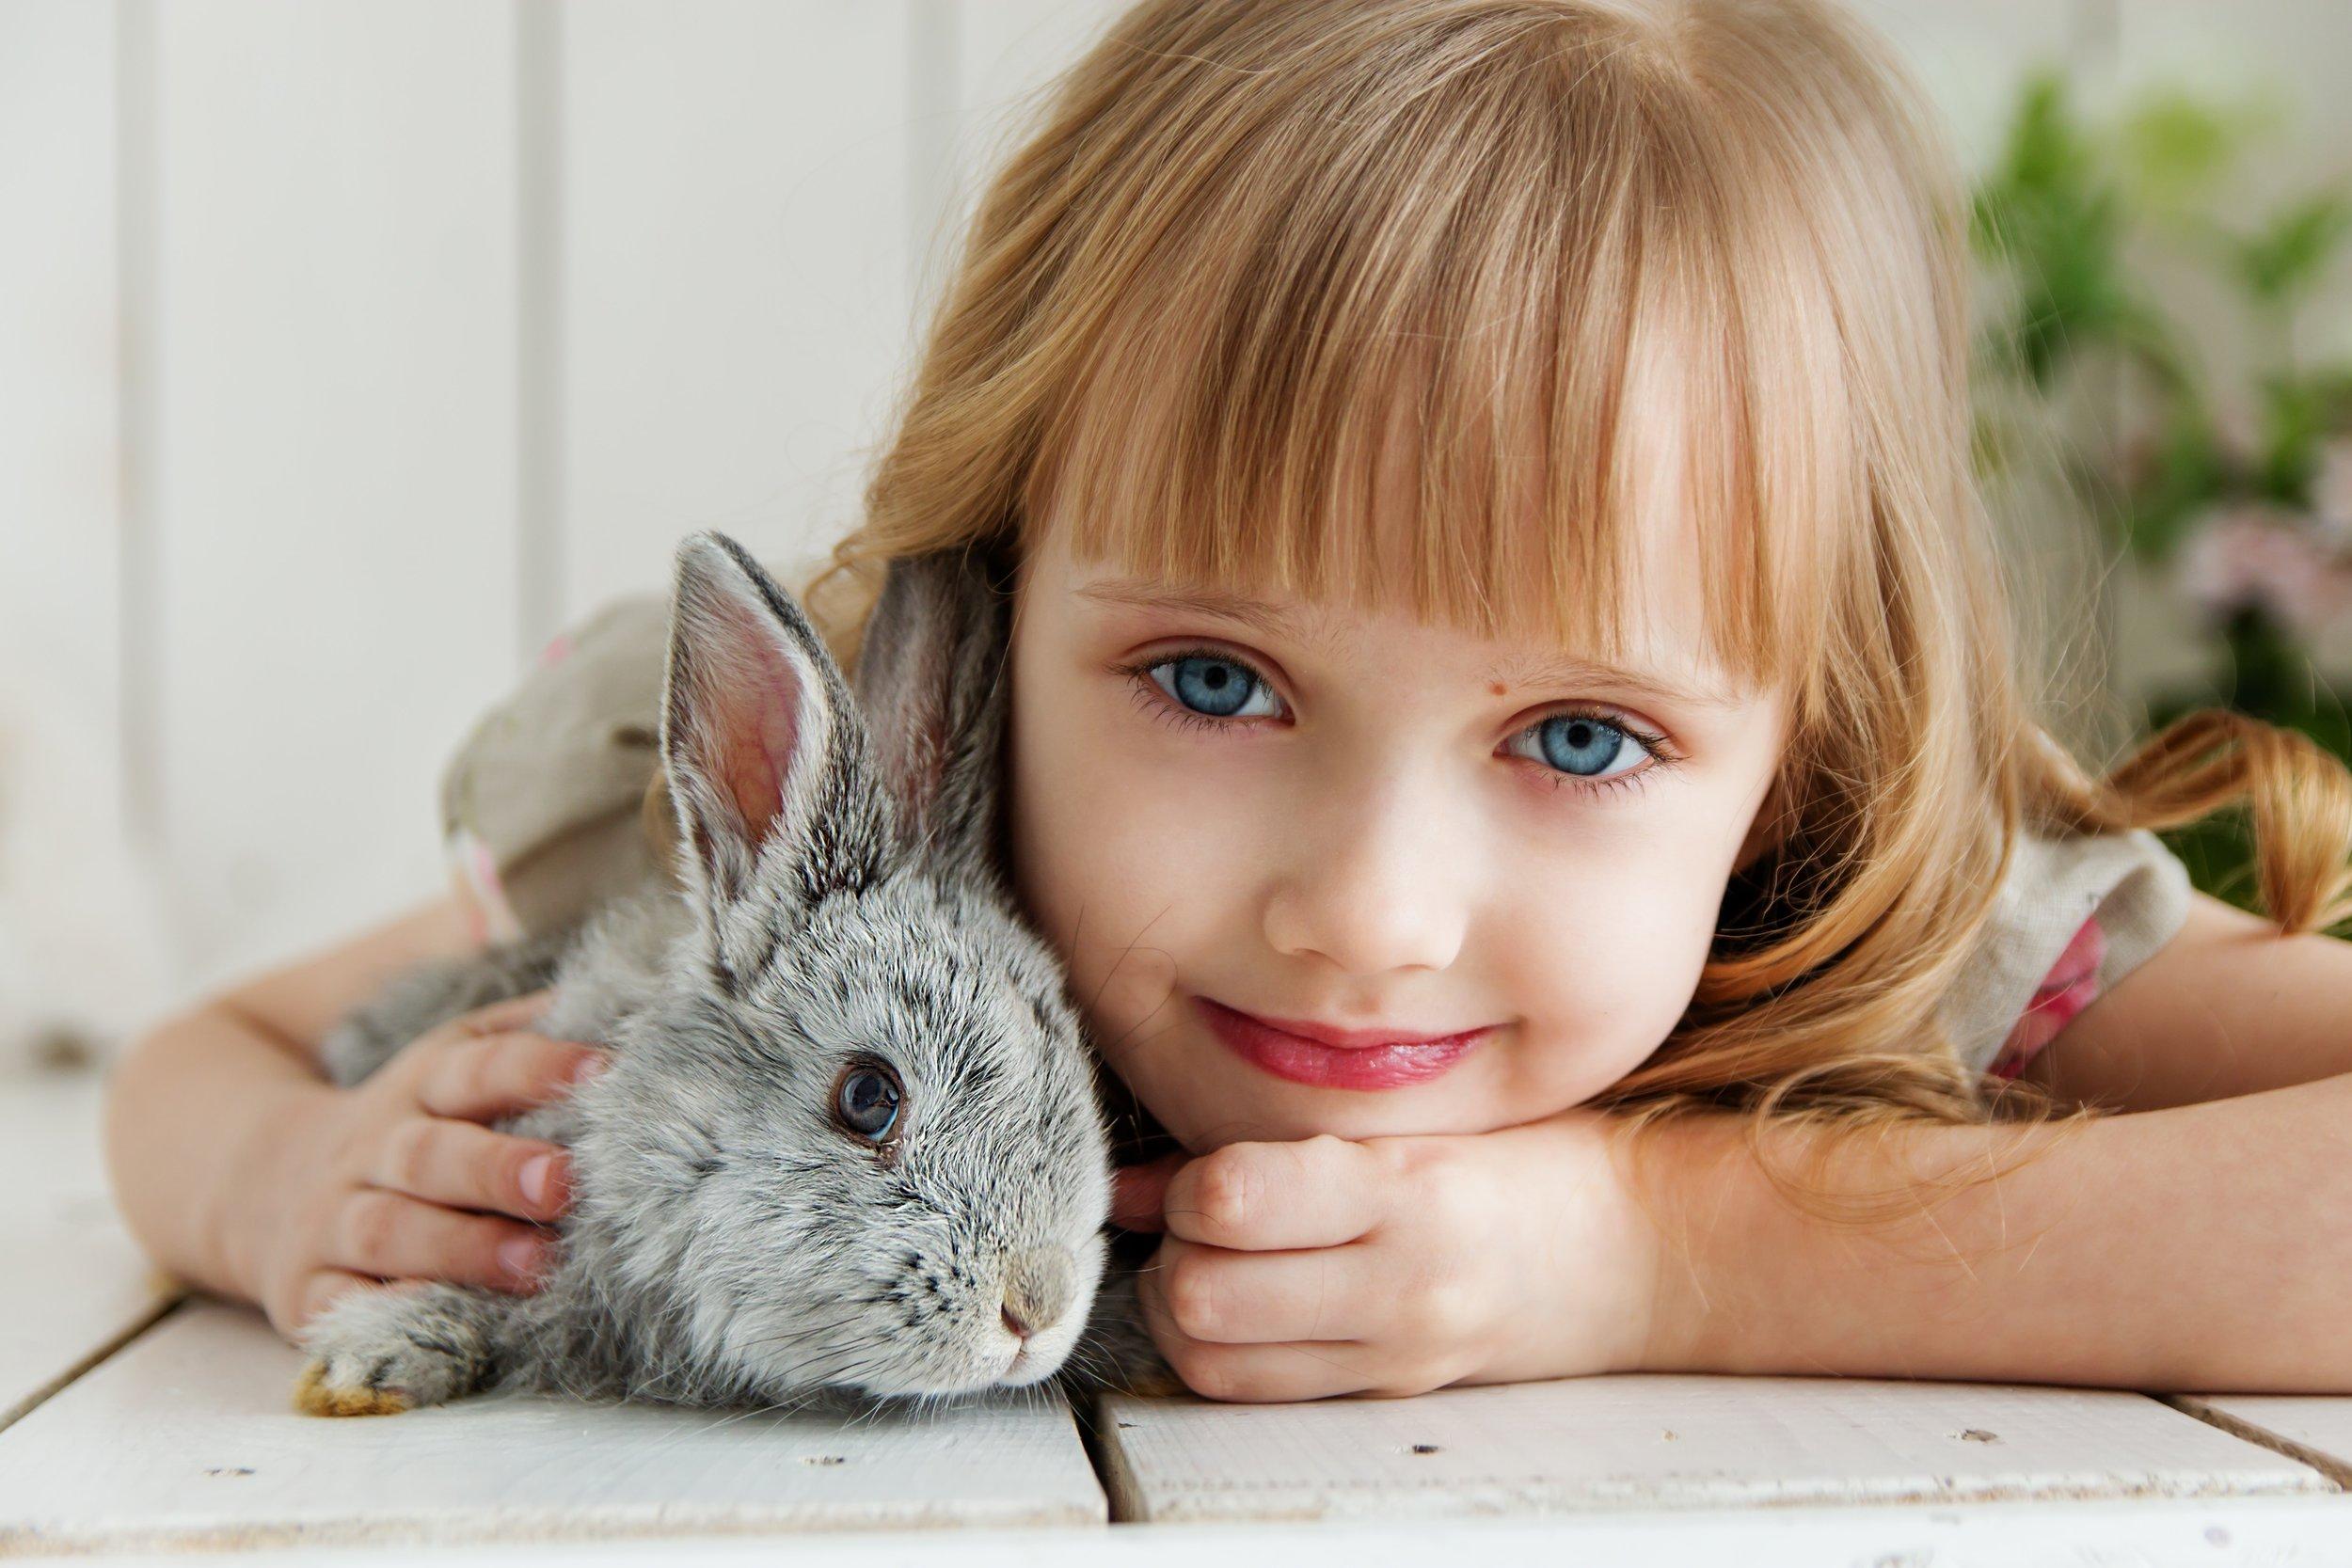 adorable-animal-attractive-1462634.jpg